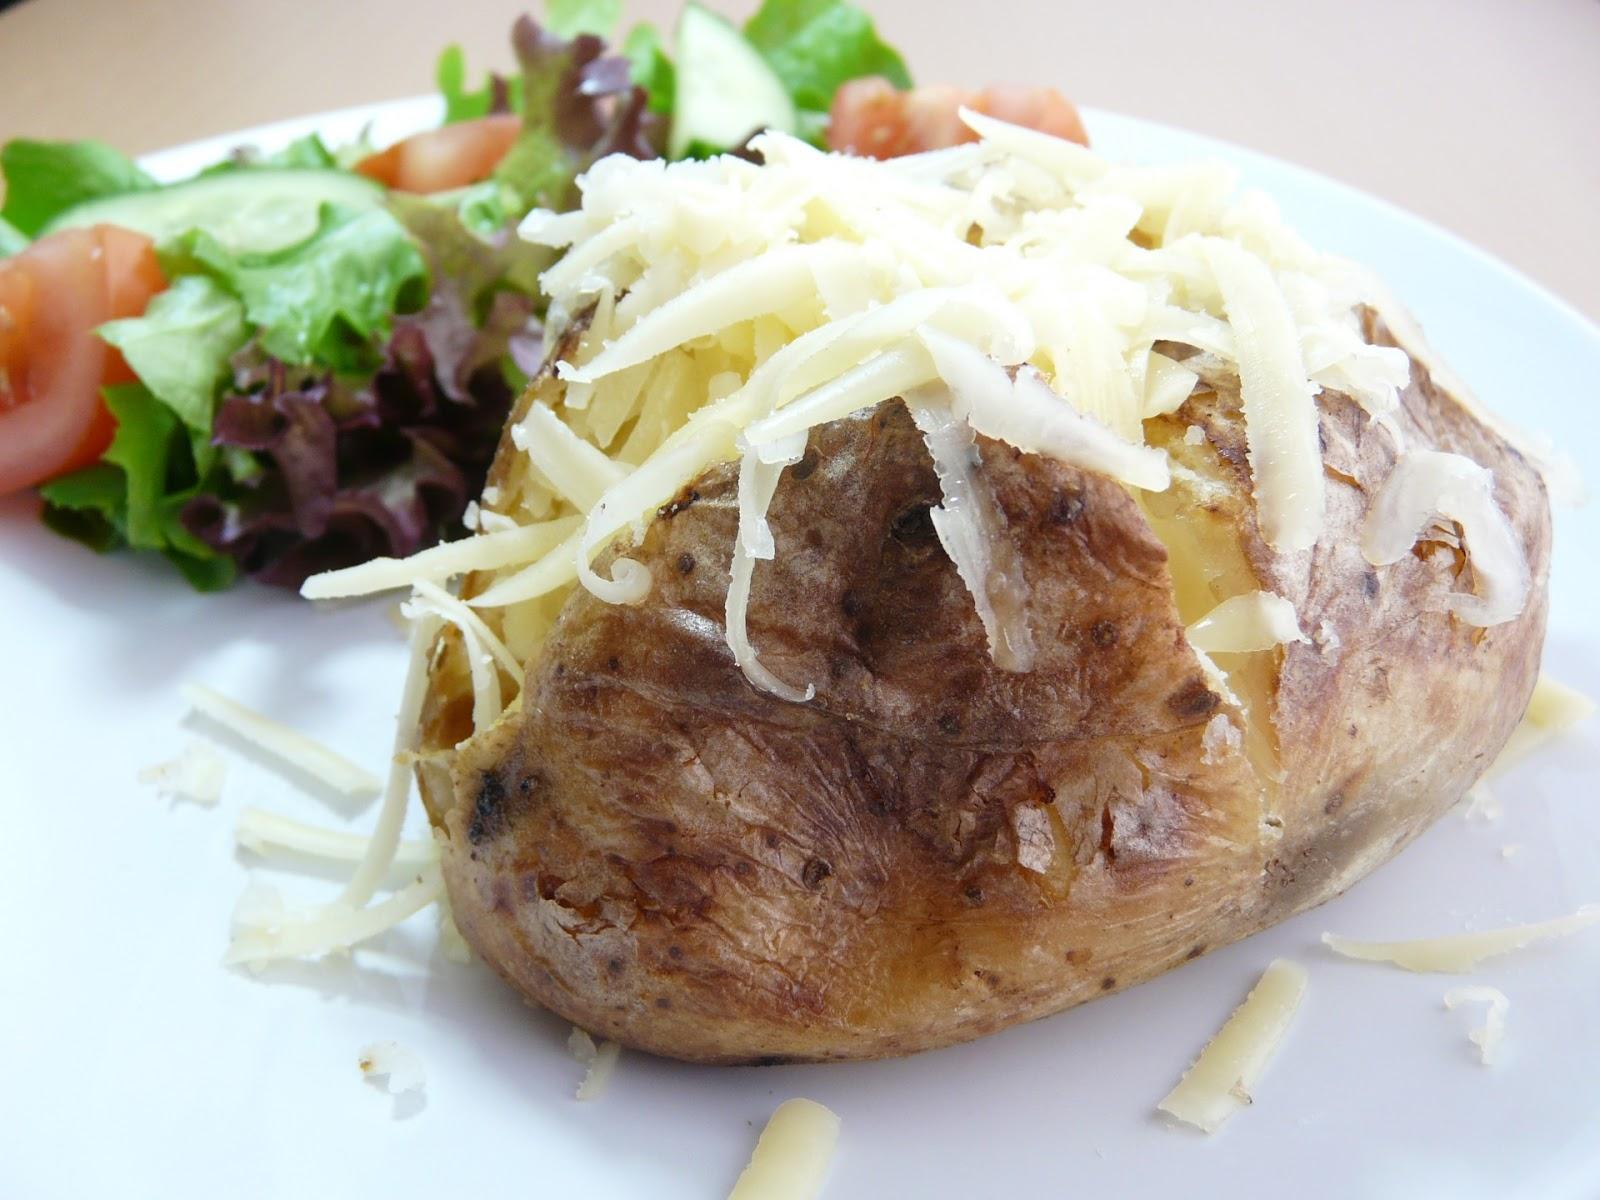 http://www.publicdomainpictures.net/pictures/50000/velka/jacket-potato-baked-potato.jpg